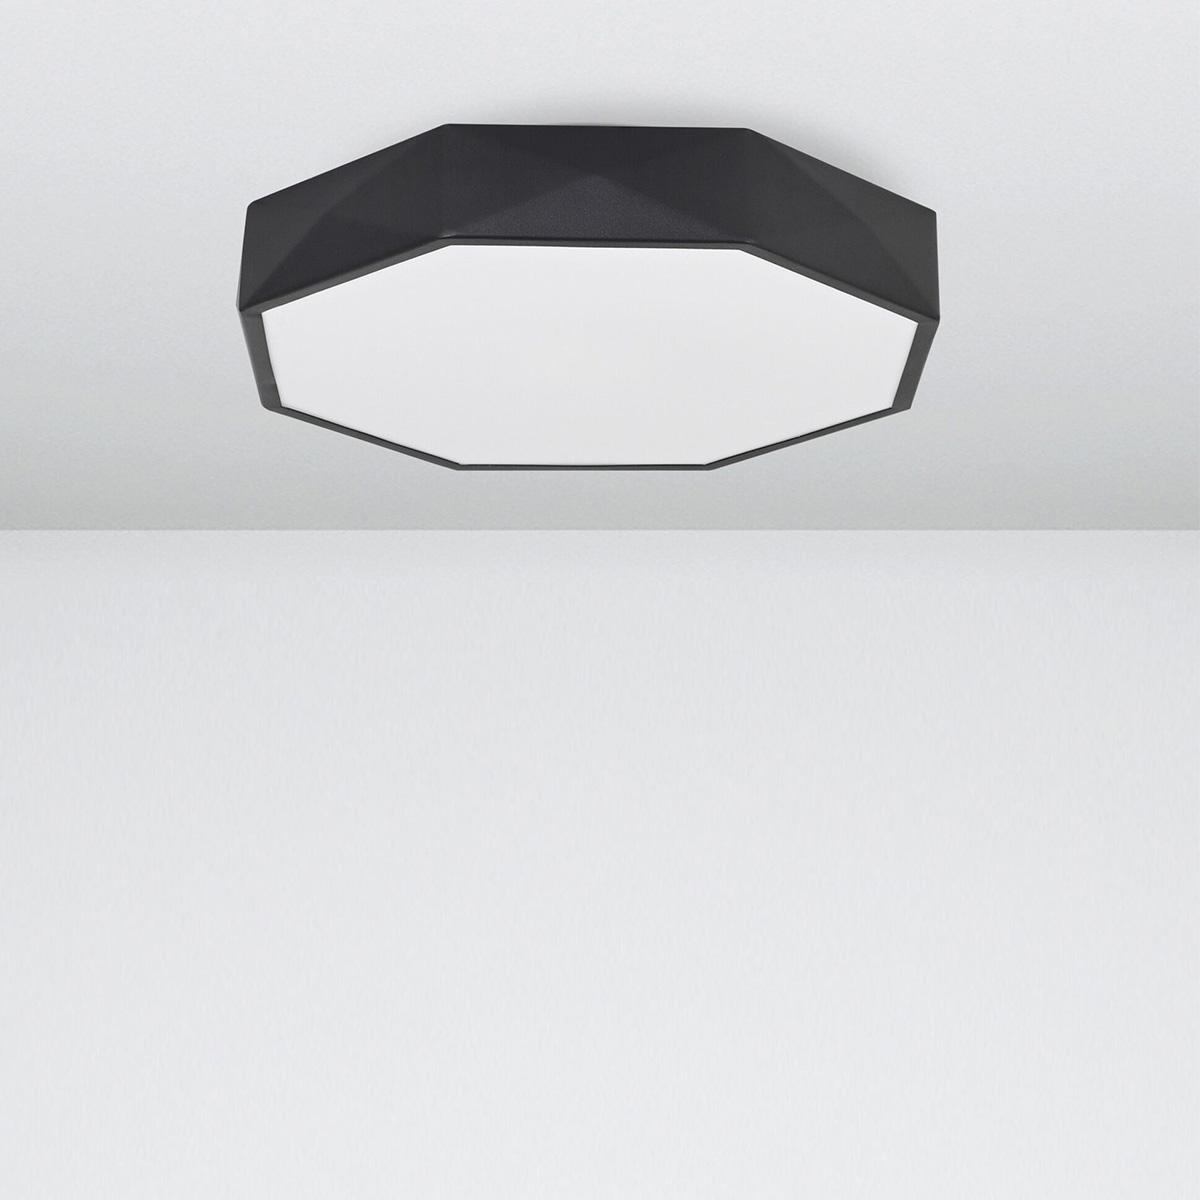 Led plafonjera Eben 9001491 crna